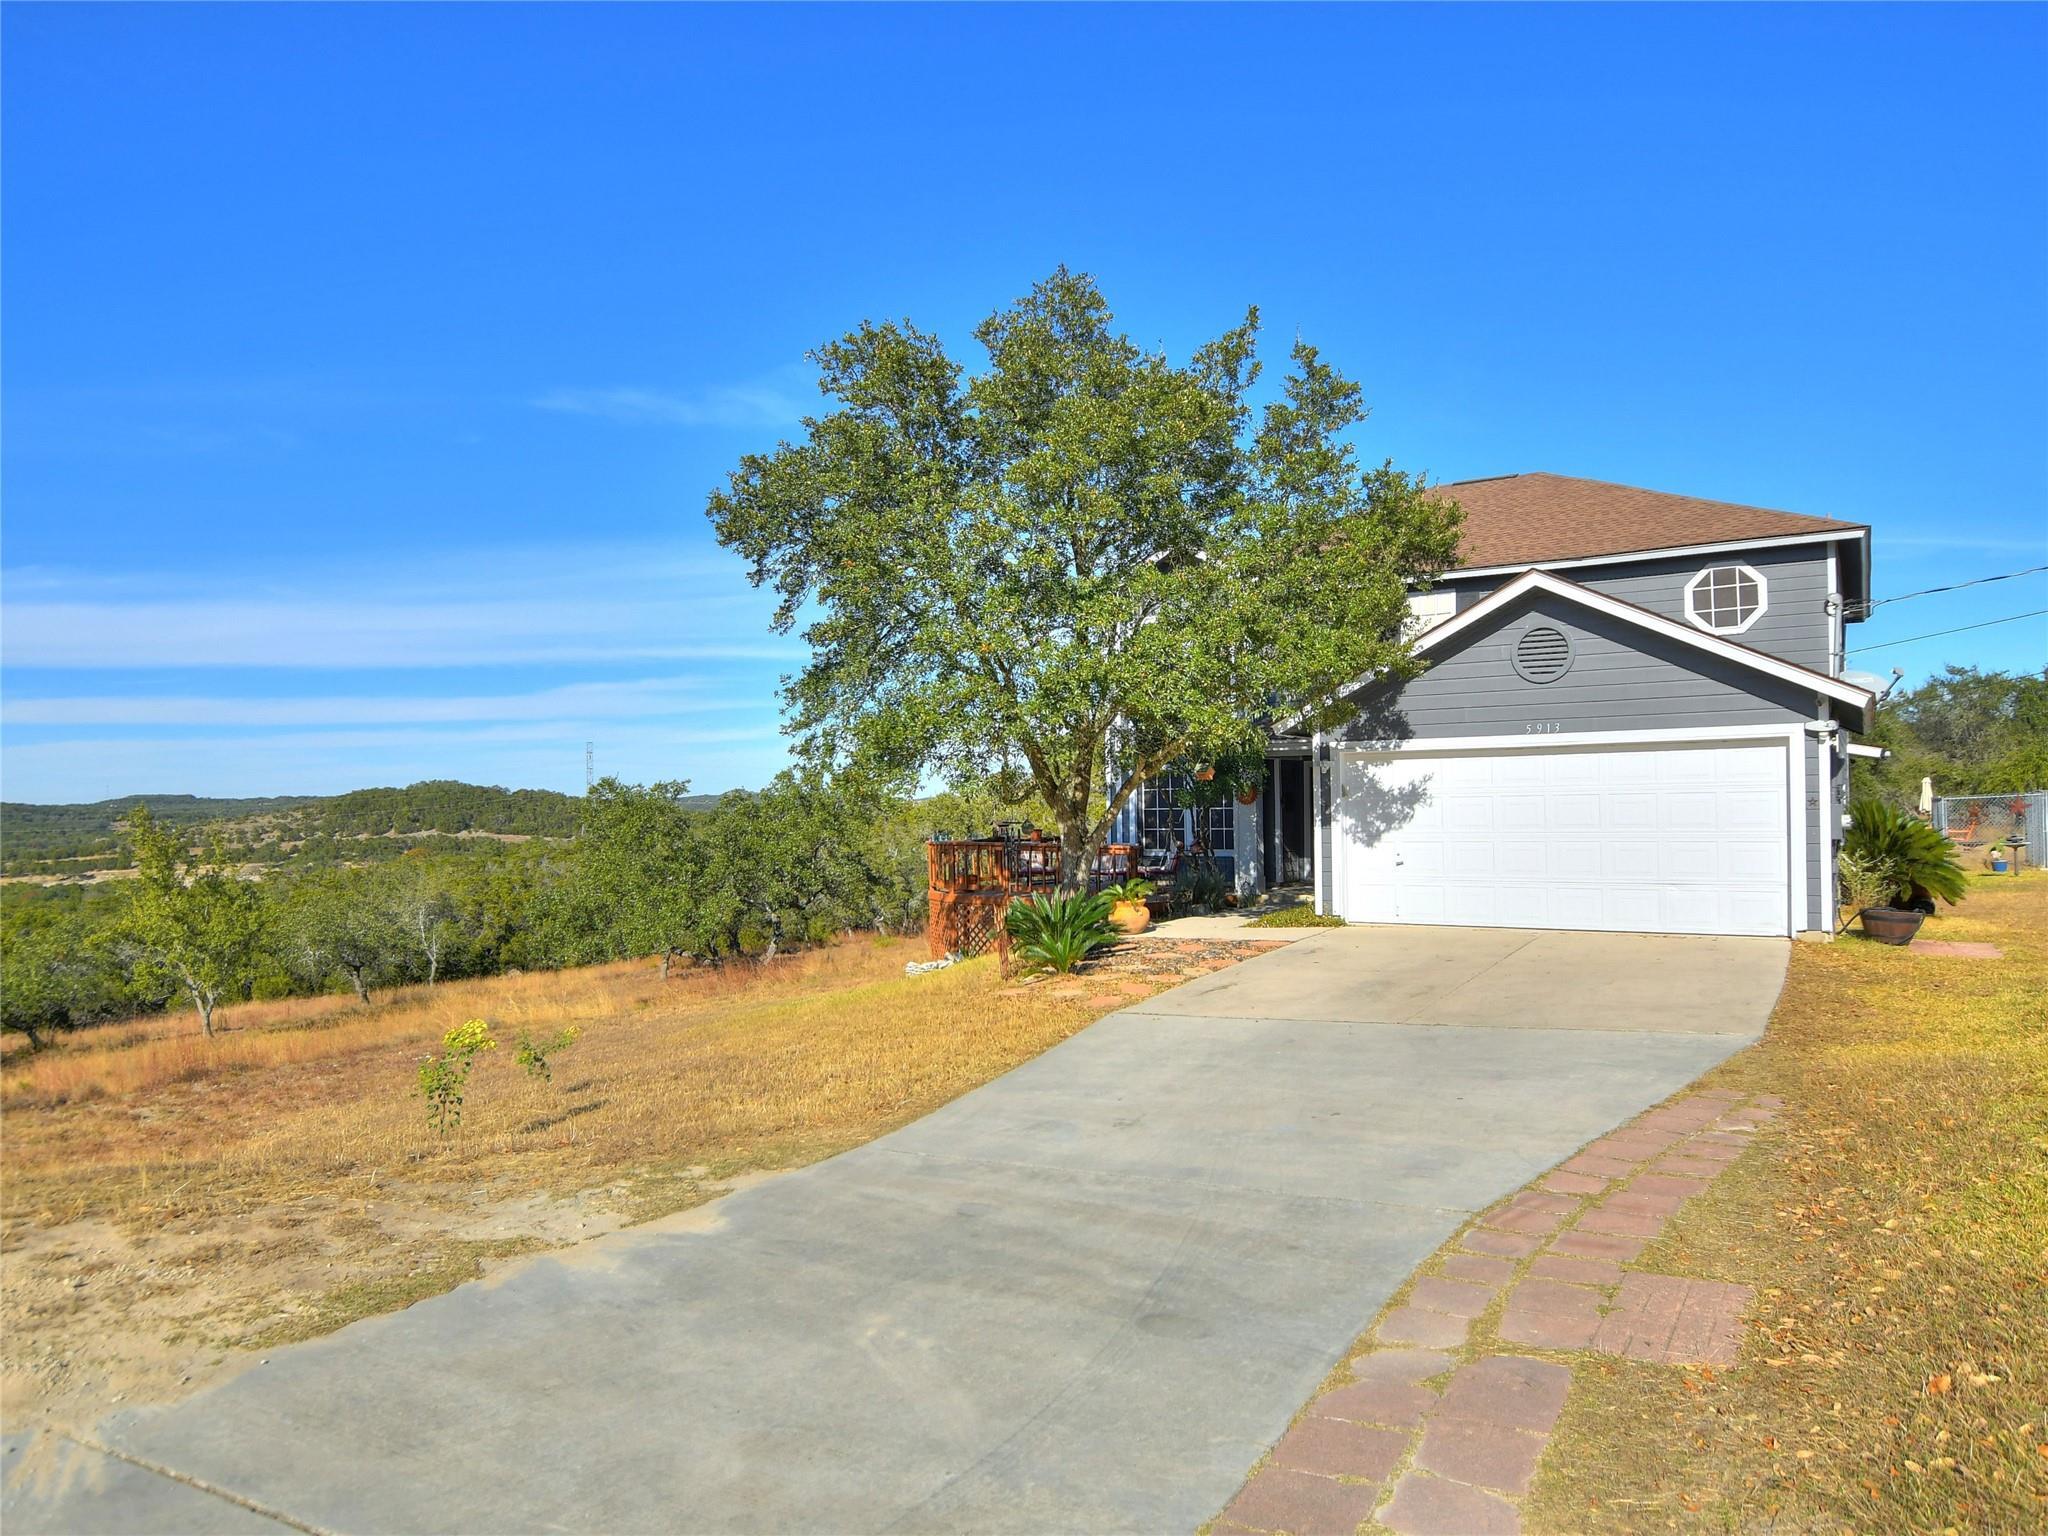 5913 Temerity Way Property Photo - Bulverde, TX real estate listing